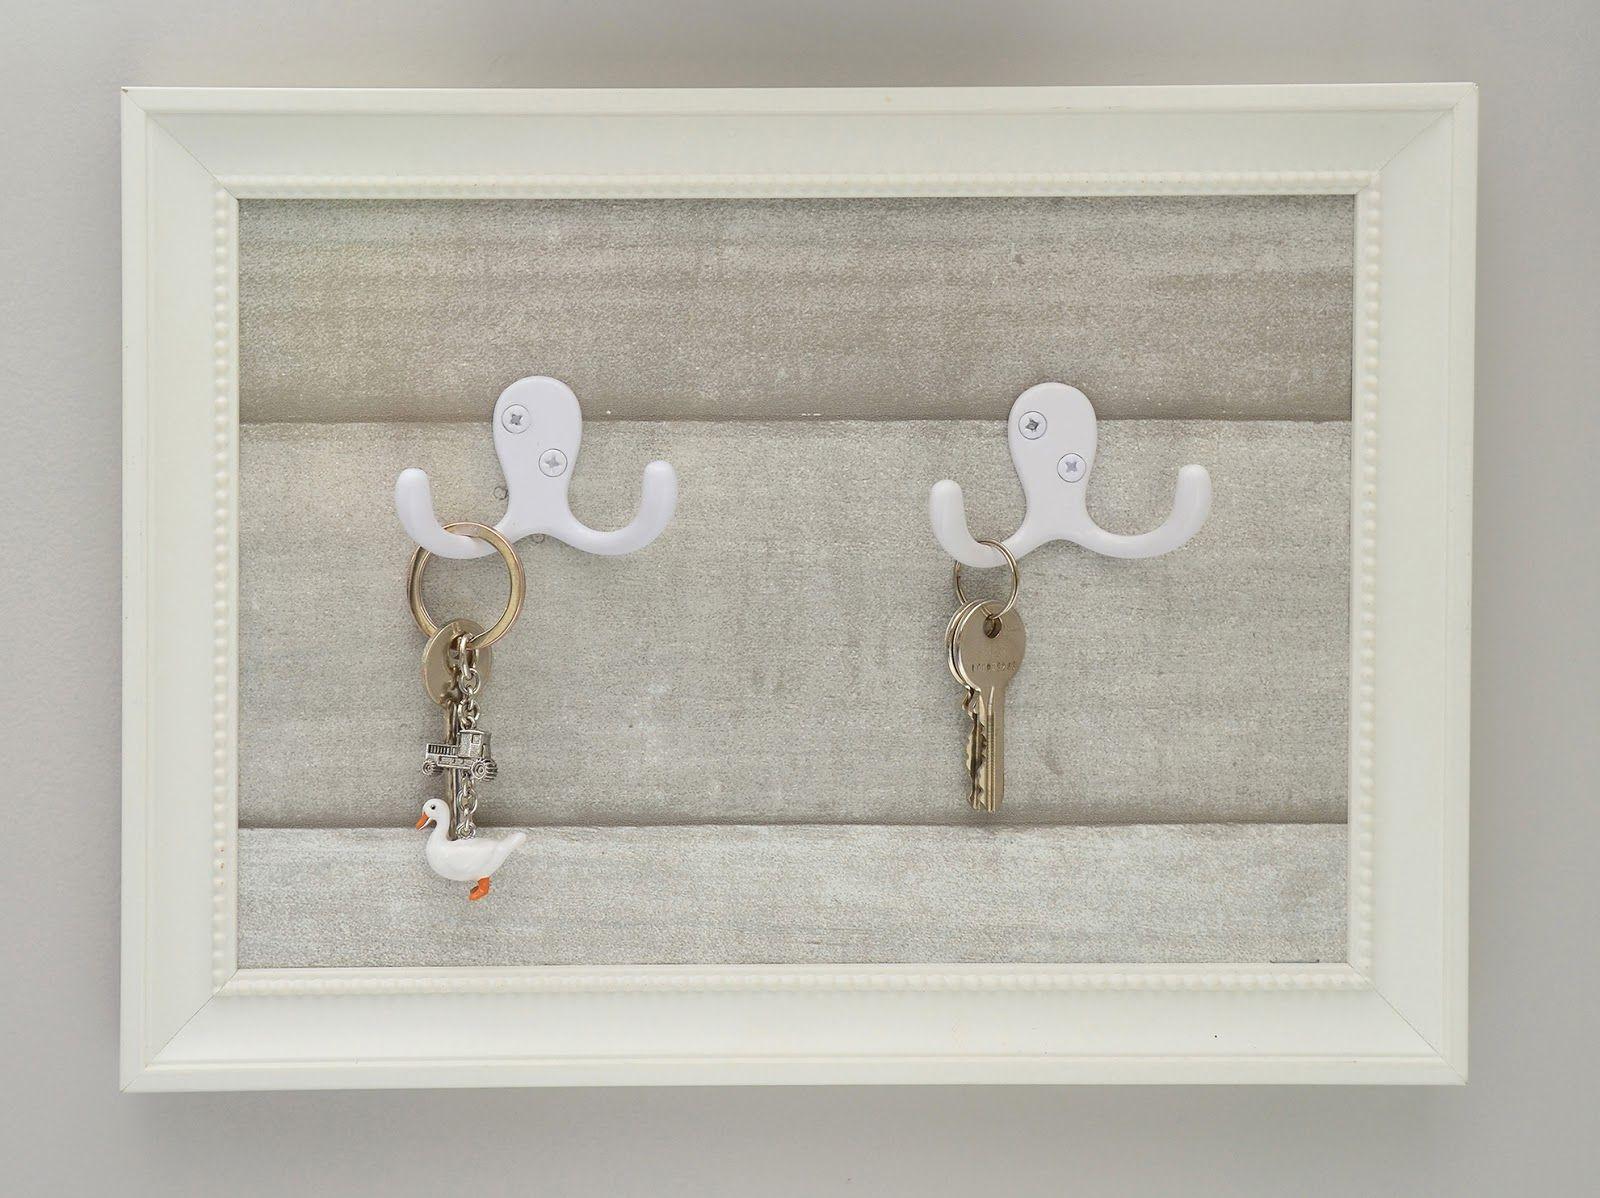 DIY Frame Key Holder 30 Superb Ways